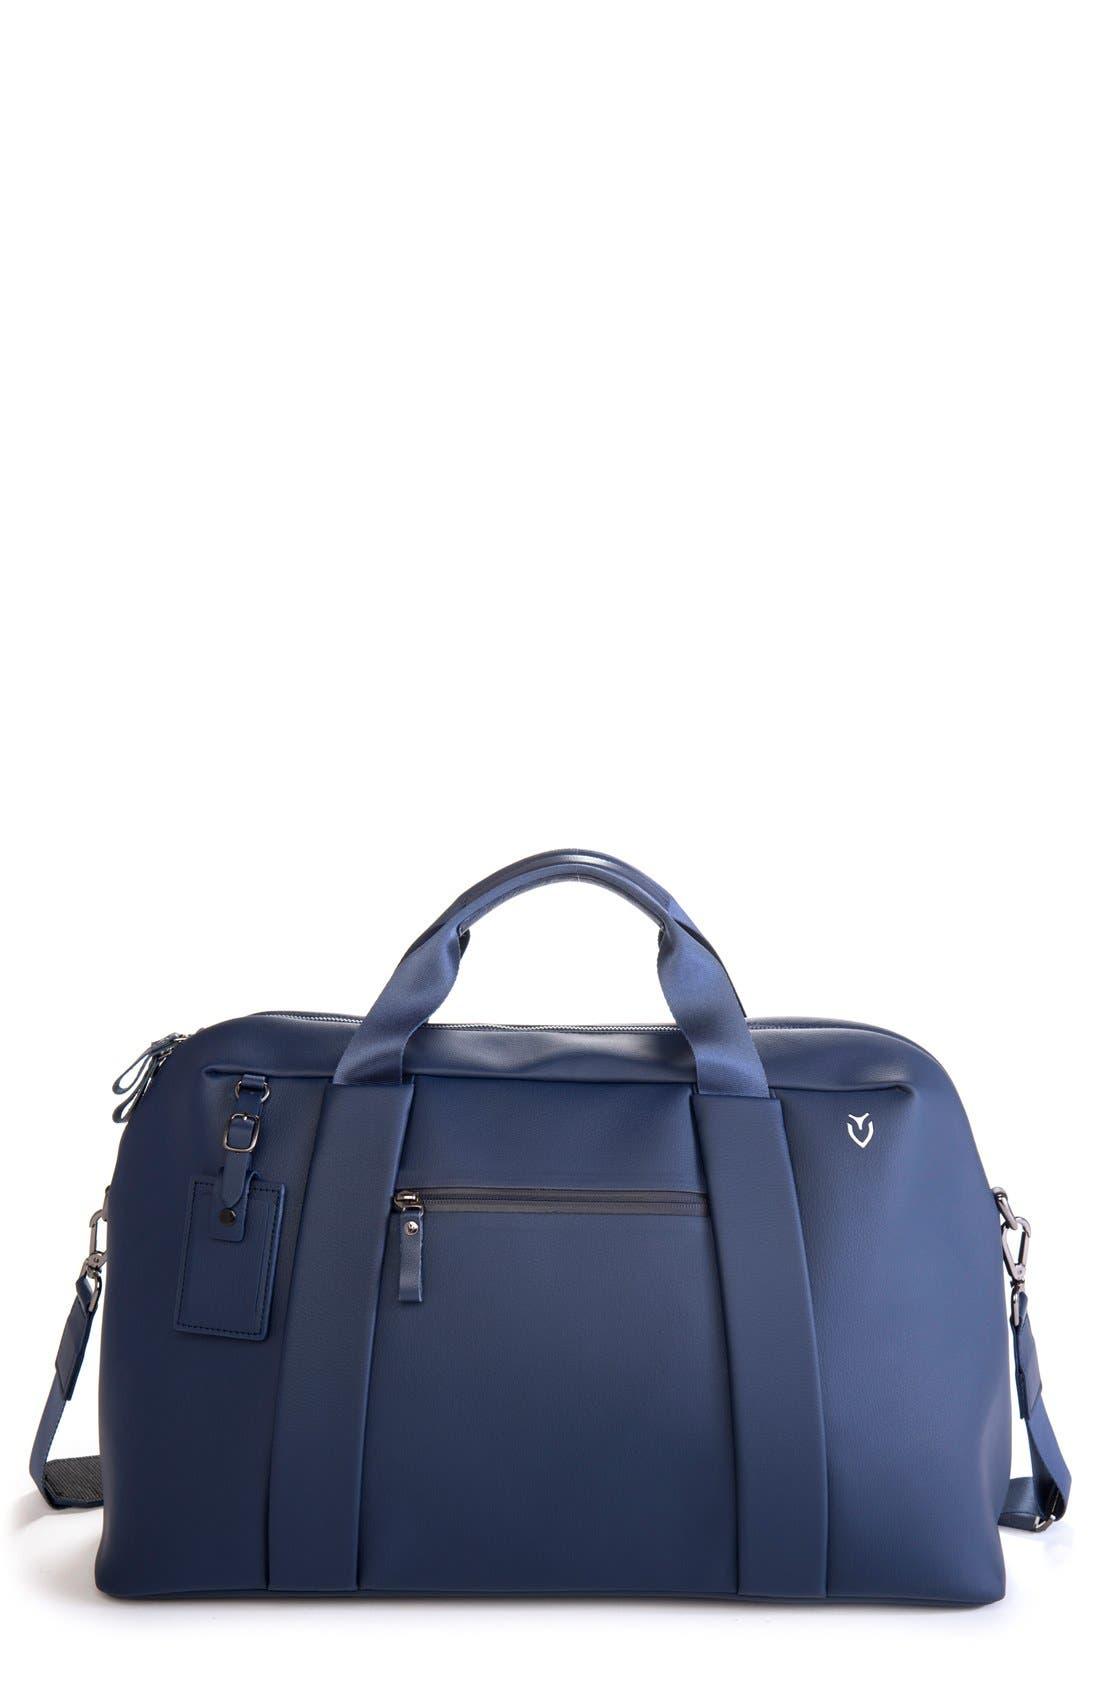 VESSEL 'Signature' Large Duffel Bag